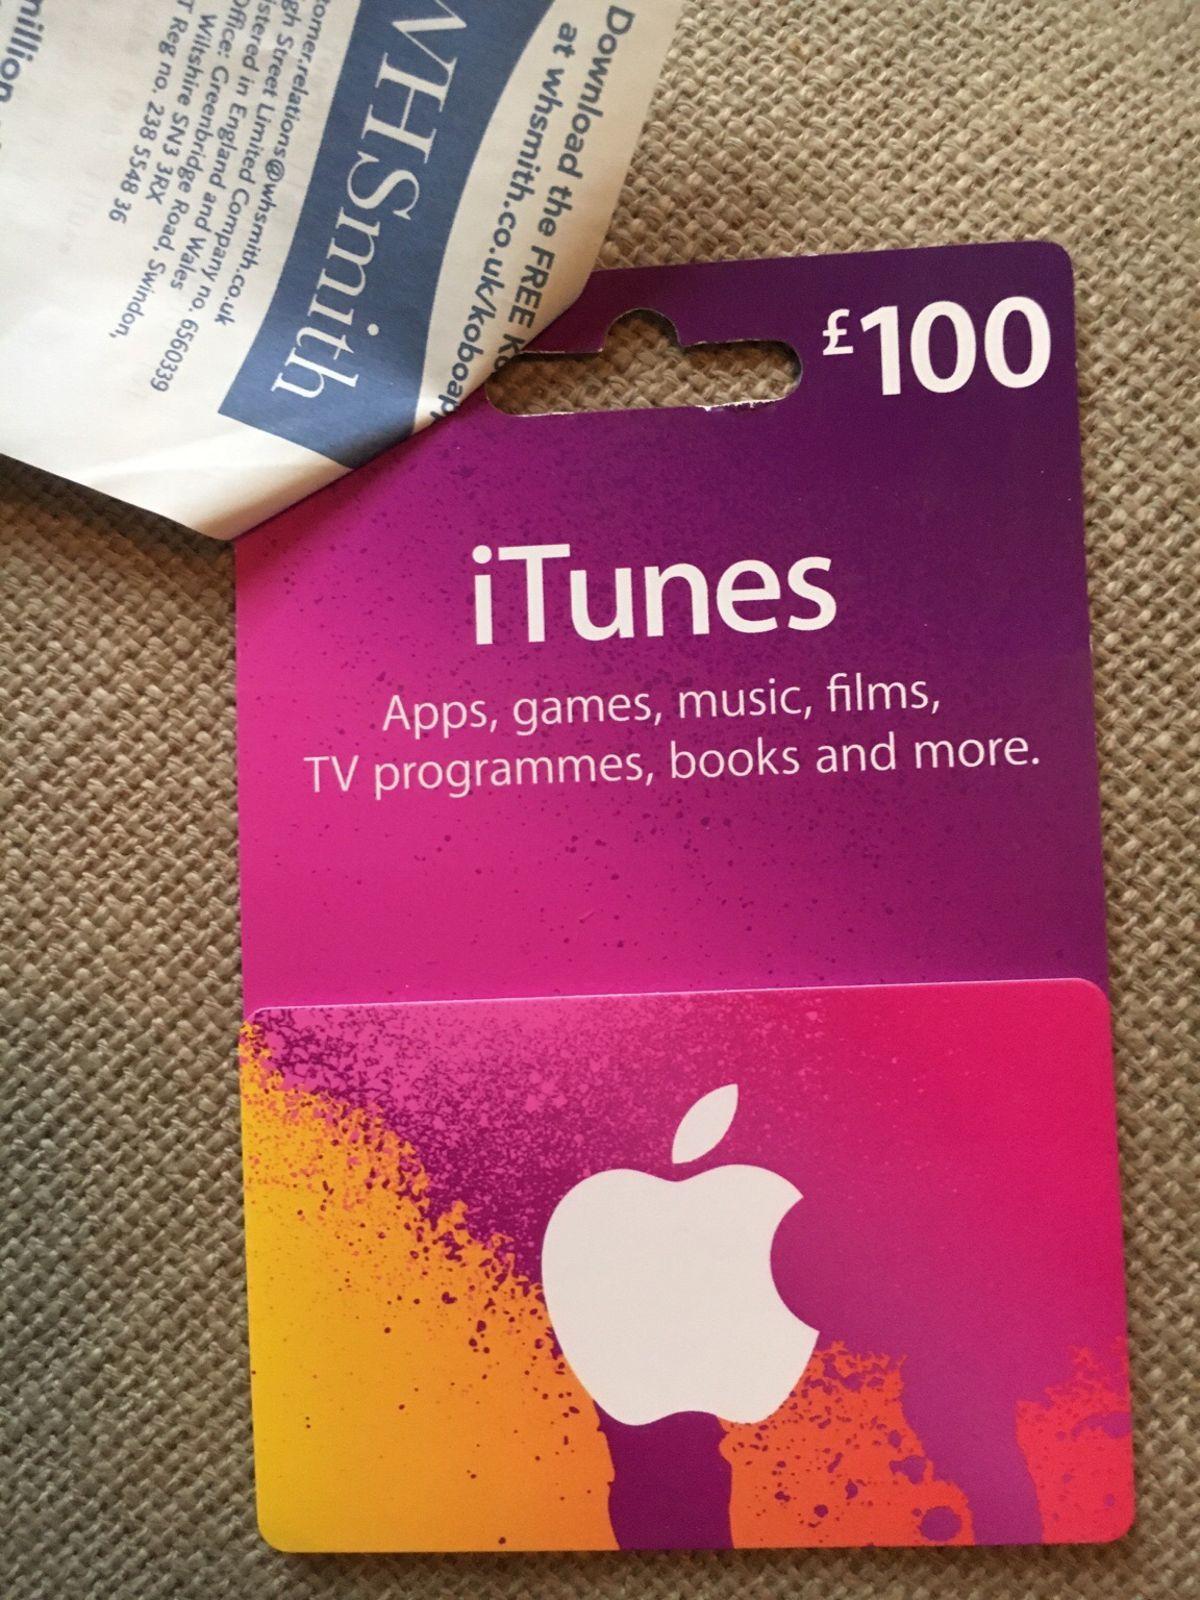 iTunes Gift Card Free itunes gift card, Itunes gift